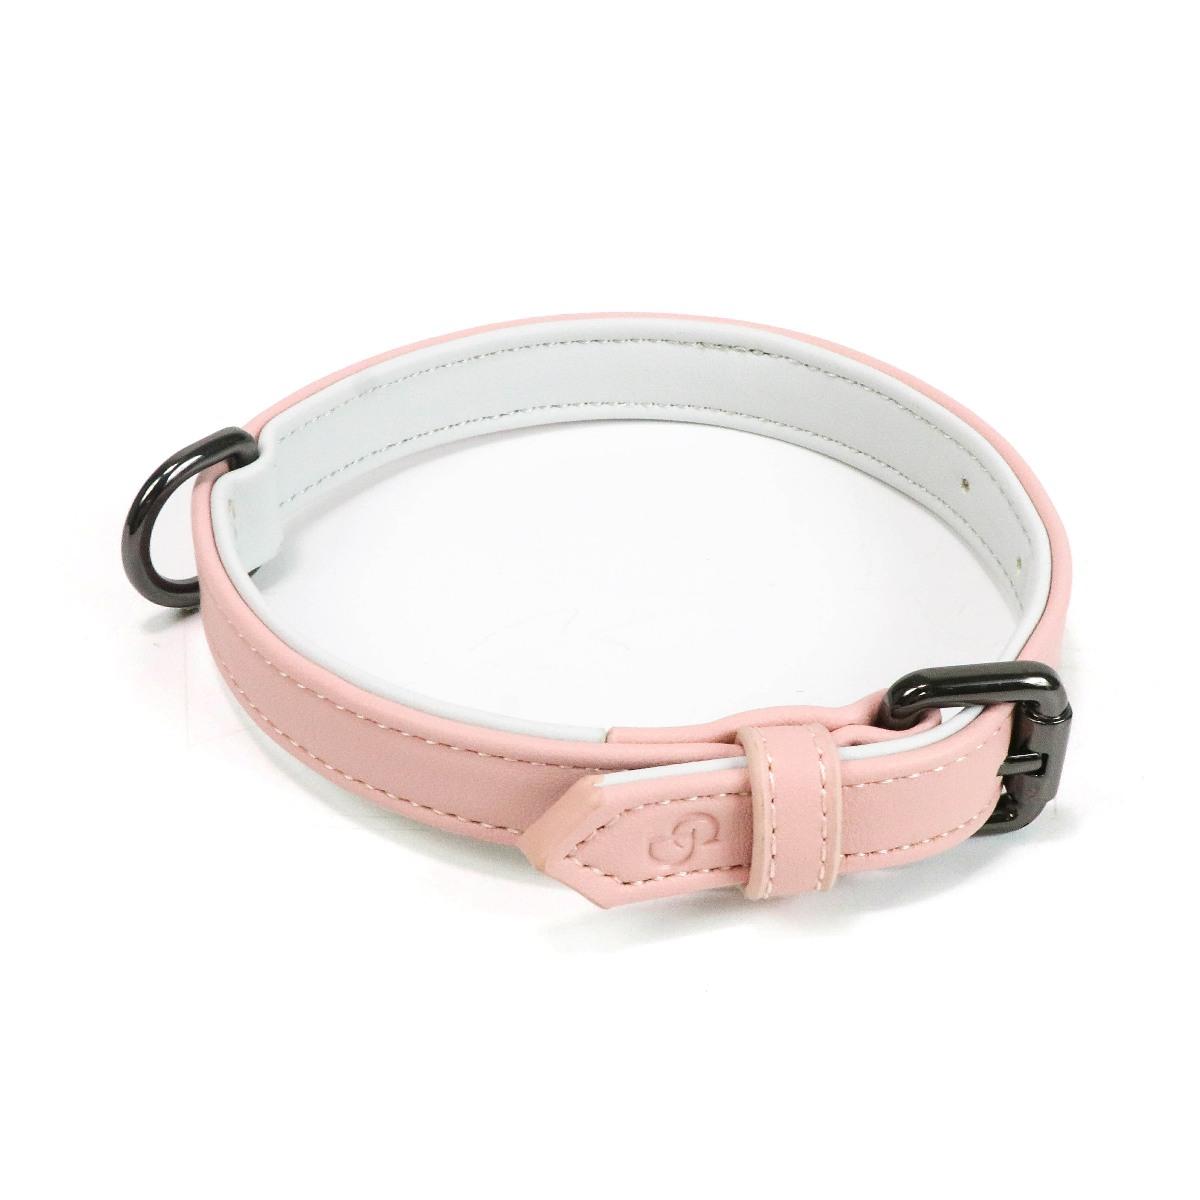 CatwalkDog Cambridge Collar in Pink